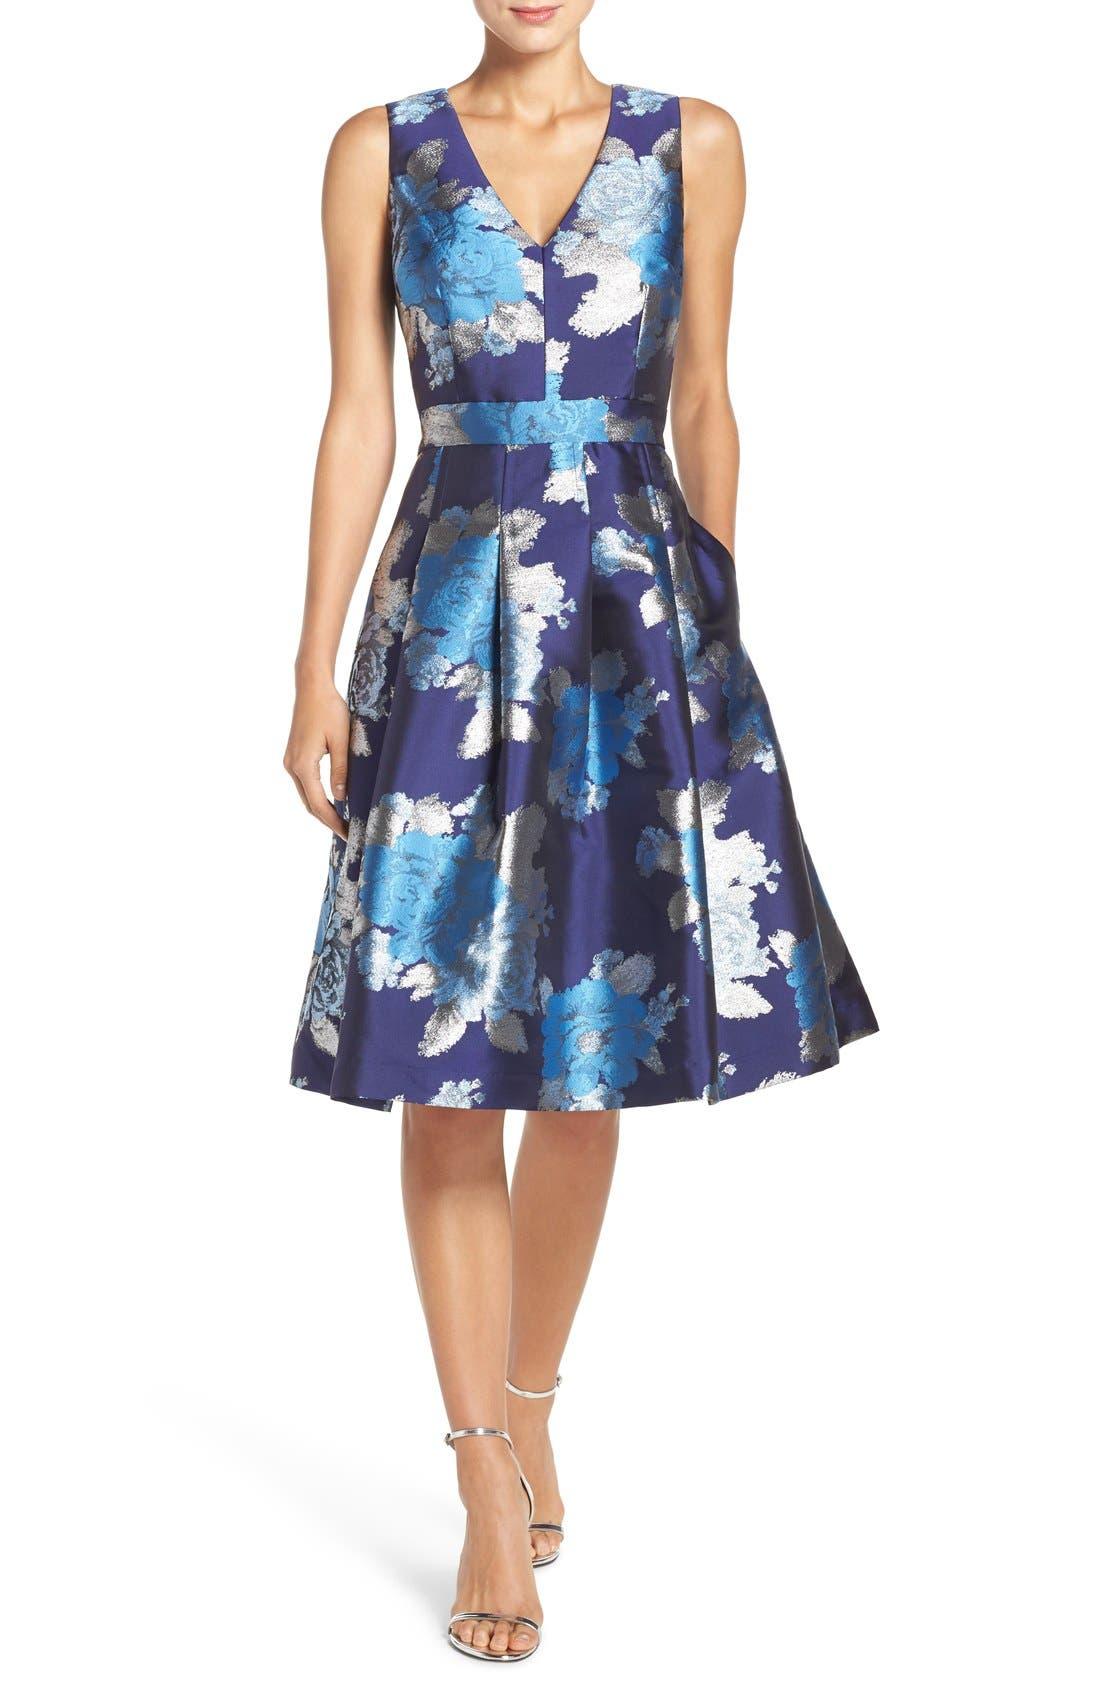 Alternate Image 1 Selected - Eliza J Metallic Jacquard Fit & Flare Dress (Regular & Petite)